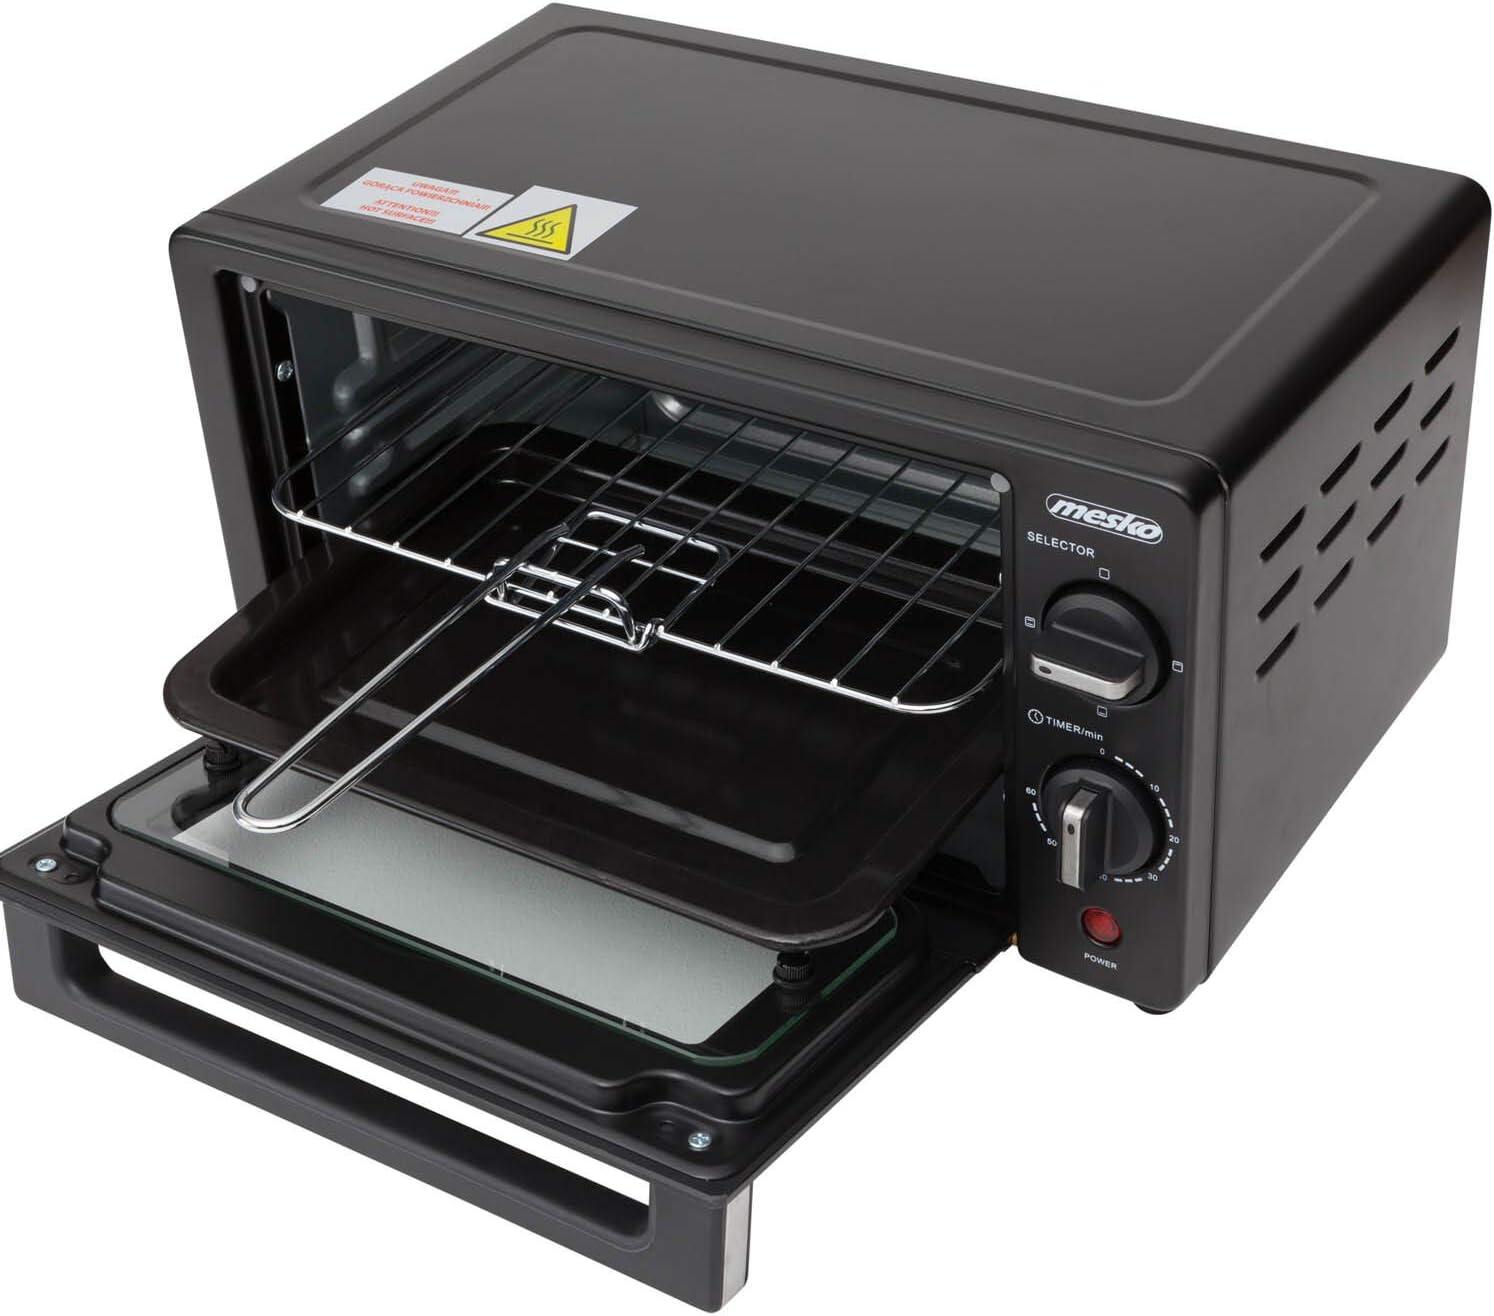 Mini Backofen 9L Elektrisch Minibackofen 1000 Watt Timer 60min Miniofen Ofen